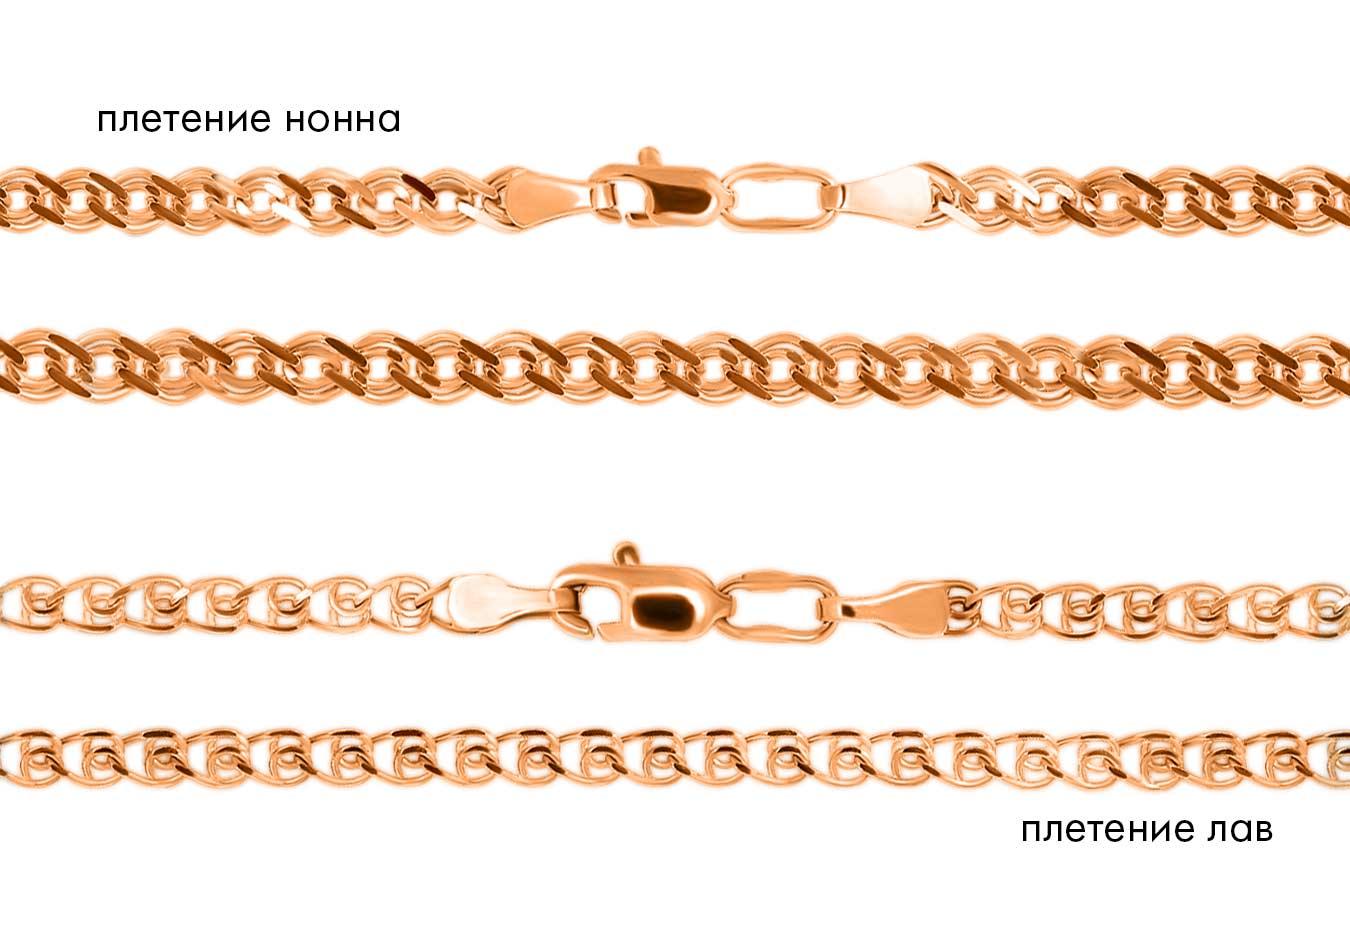 Золотые цепочки, тип плетения нонна и лав.